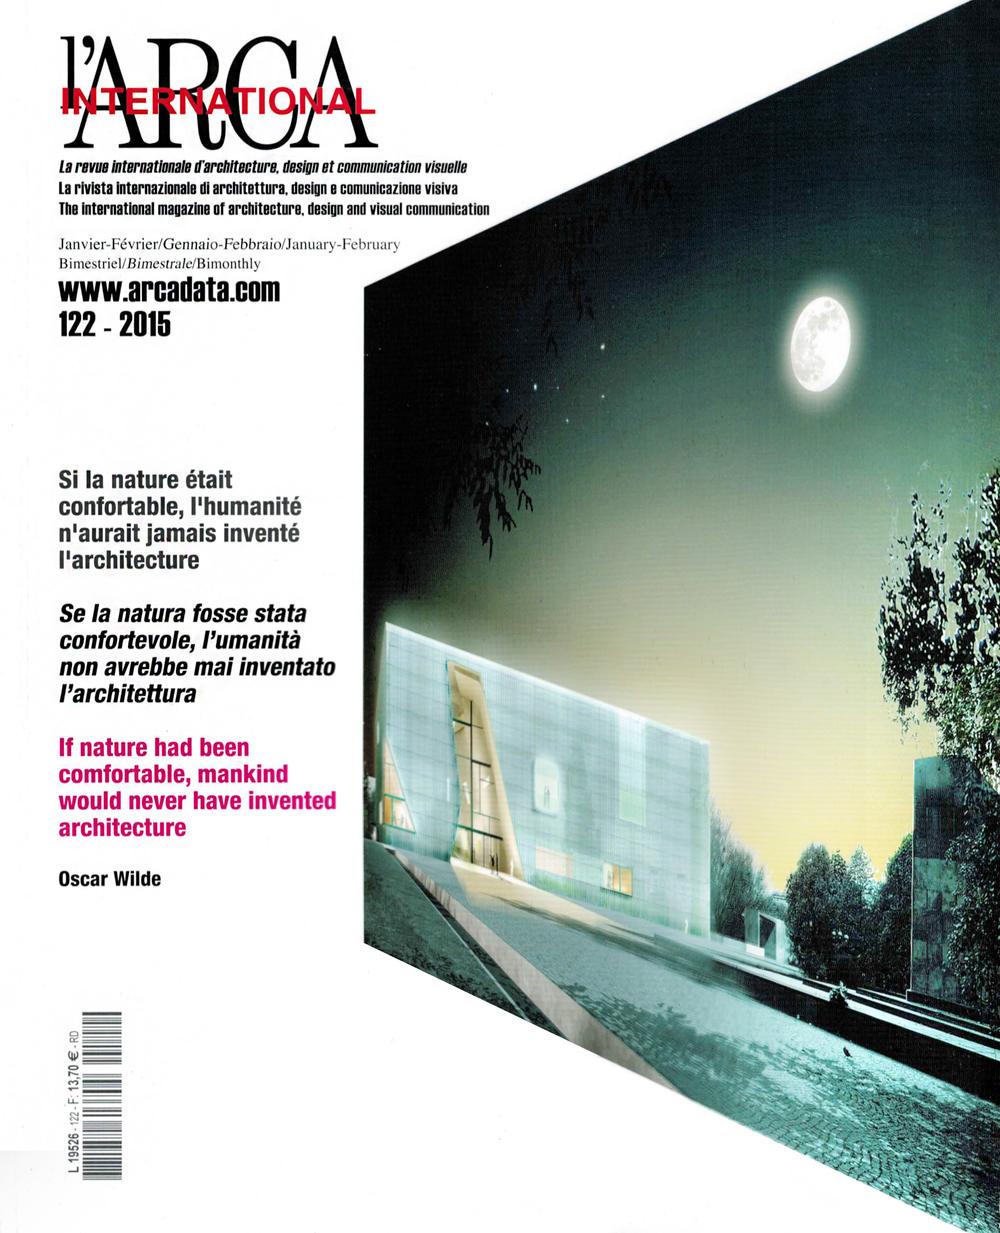 L'ARCA INTERNATIONAL  01/15